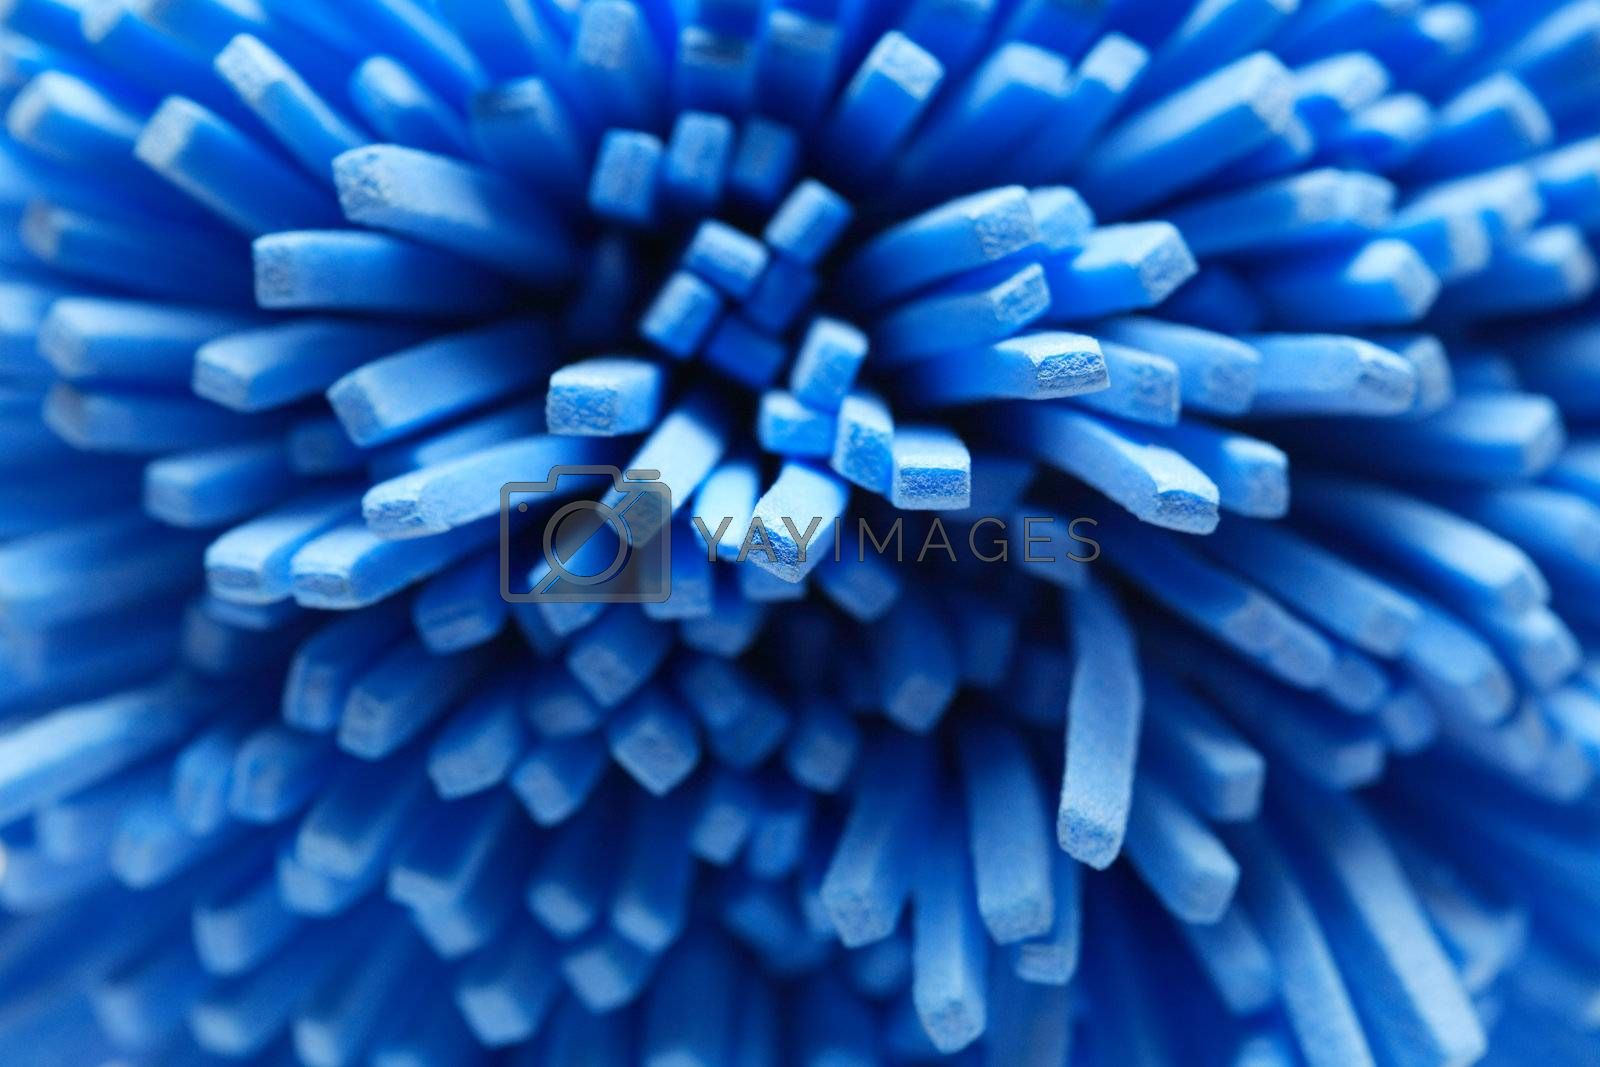 Royalty free image of Blue Abstract by kvkirillov